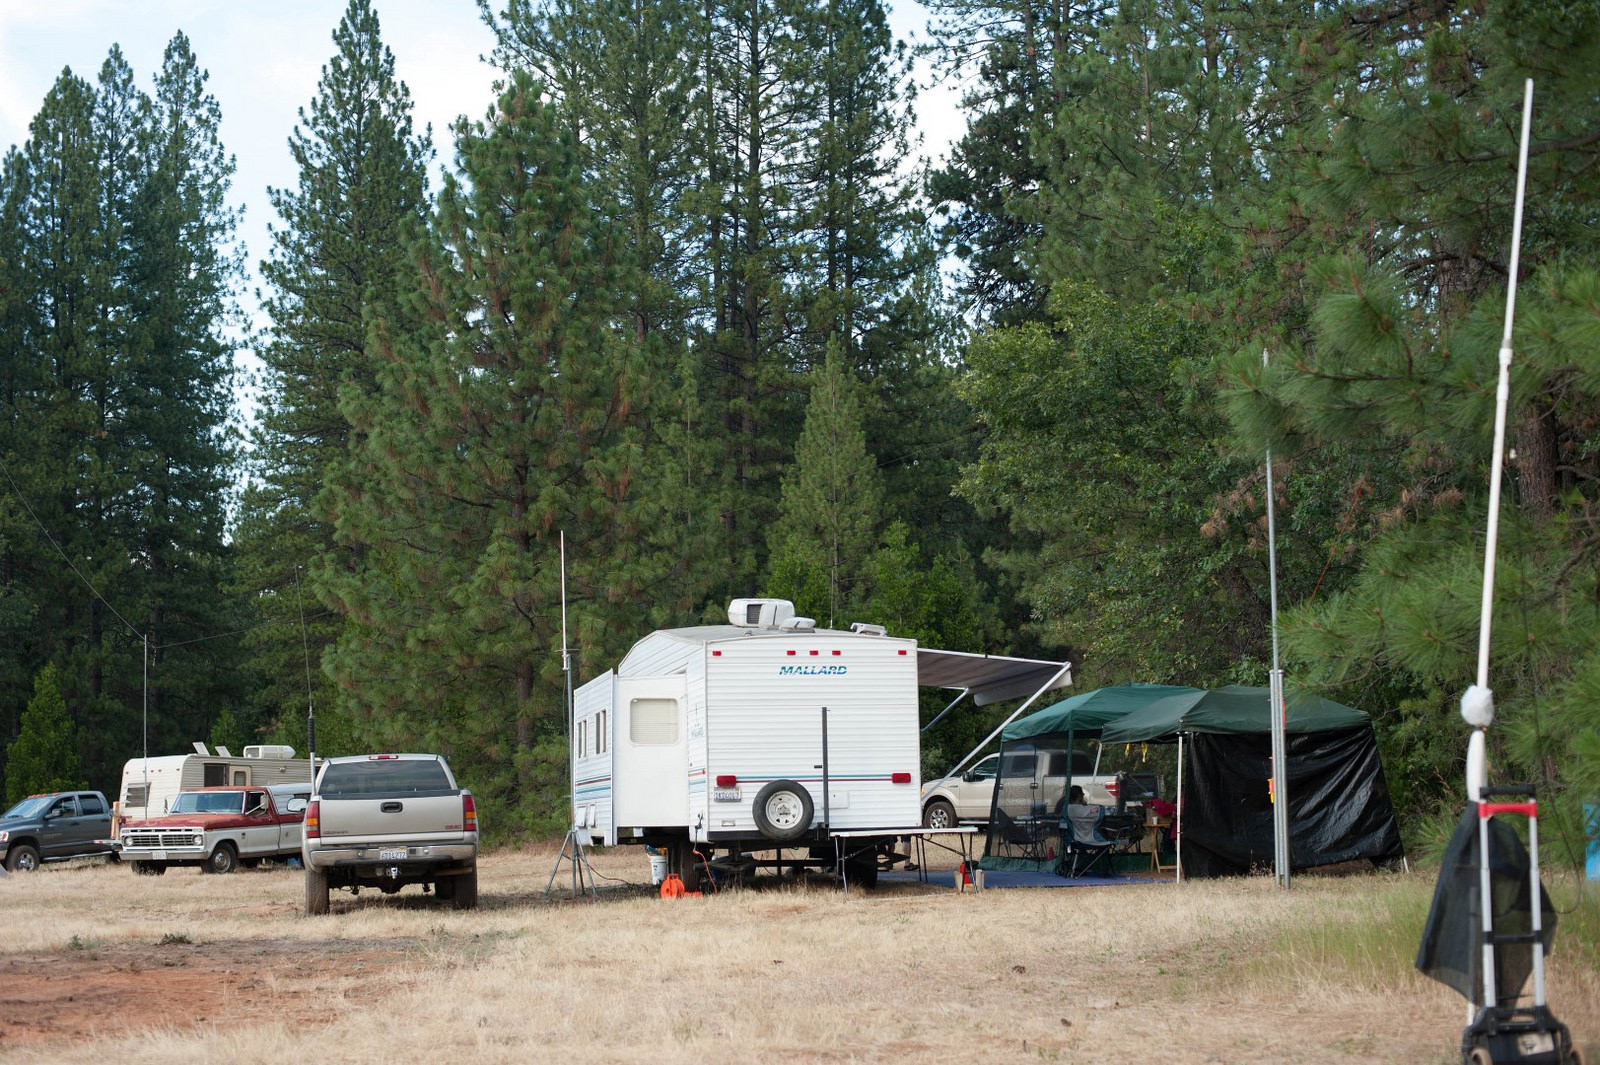 East Camp